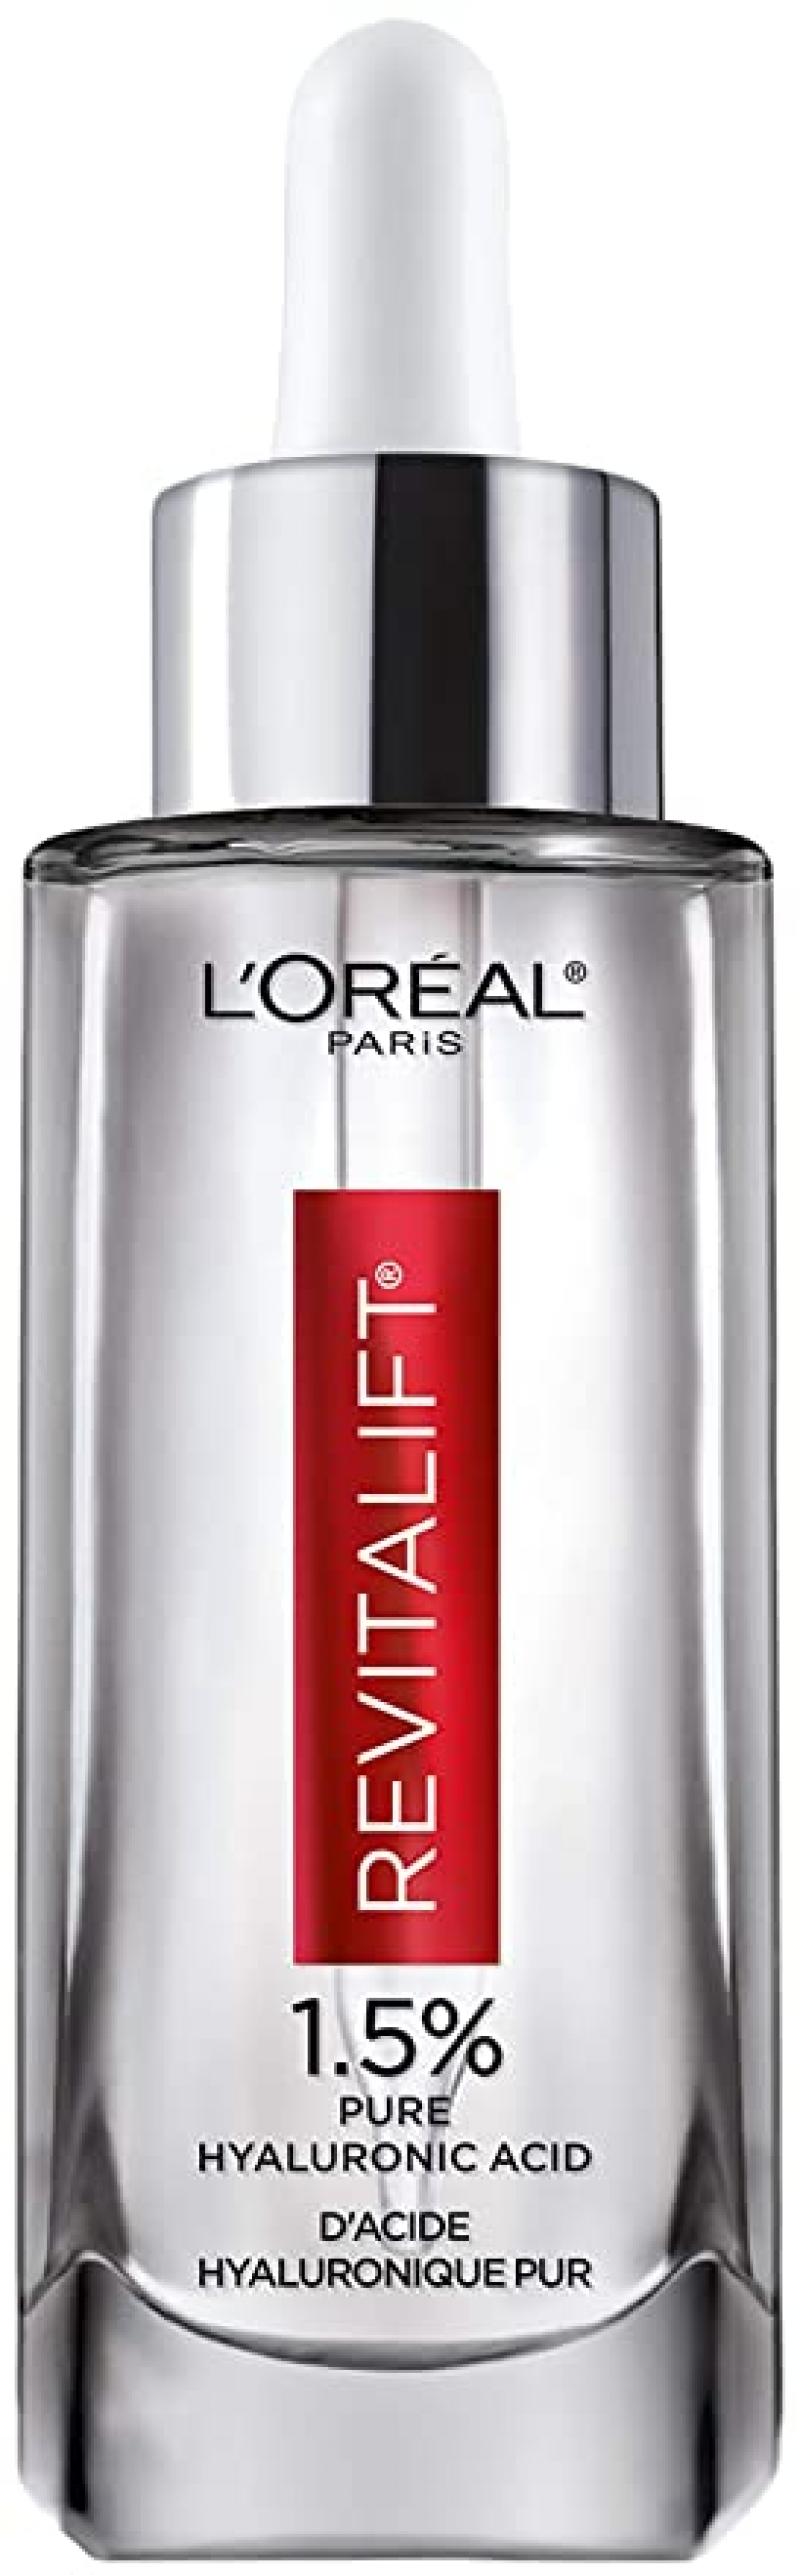 ihocon: L'Oreal Paris Skincare Revitalift Derm Intensives 1.5% Pure Hyaluronic Acid Face Serum, 1.7 Oz 歐萊雅玻尿酸精華液